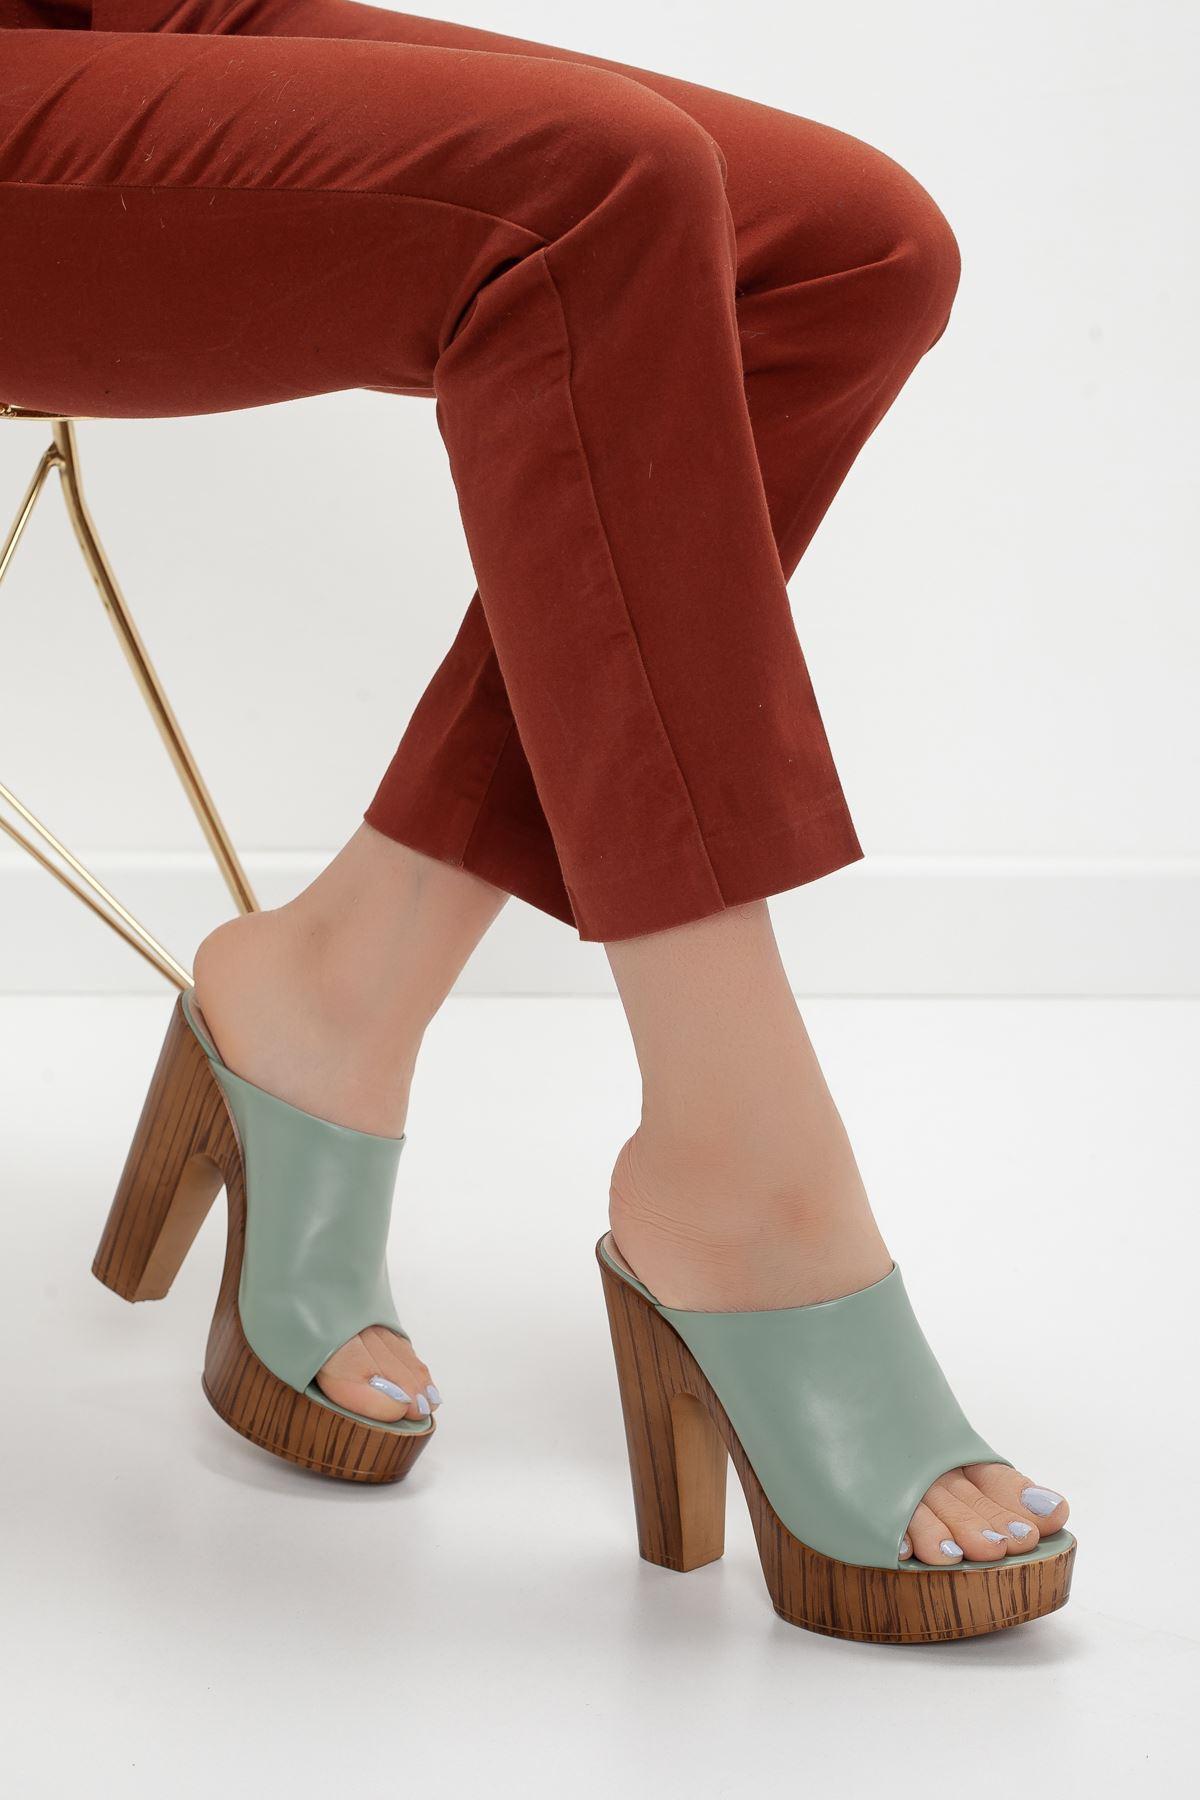 la notte platform topuklu cilt ayakkabı Yeşil